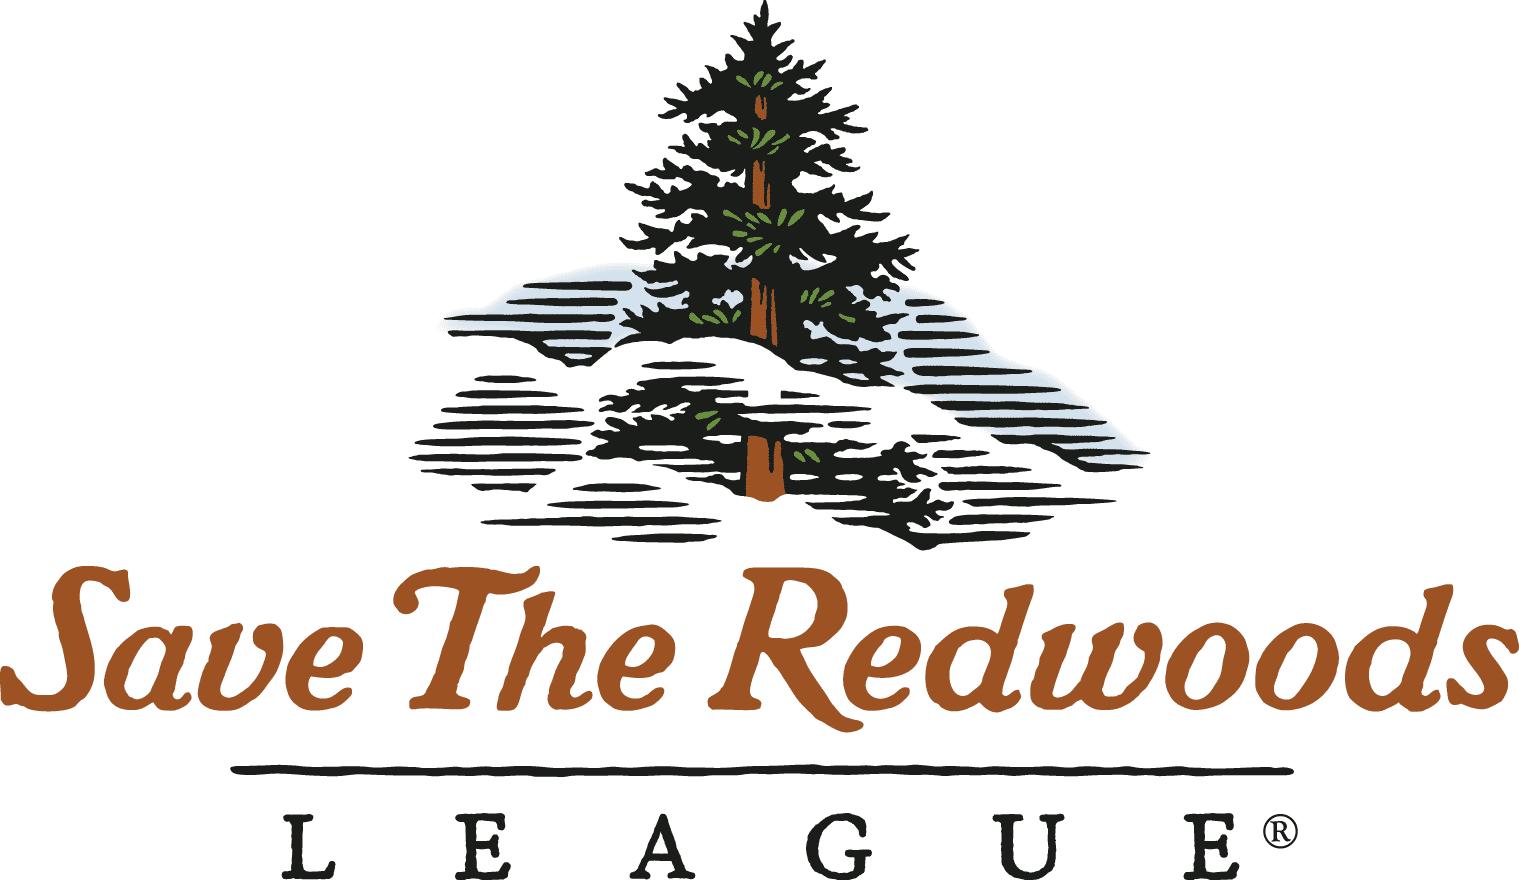 Savetheredwoods logo